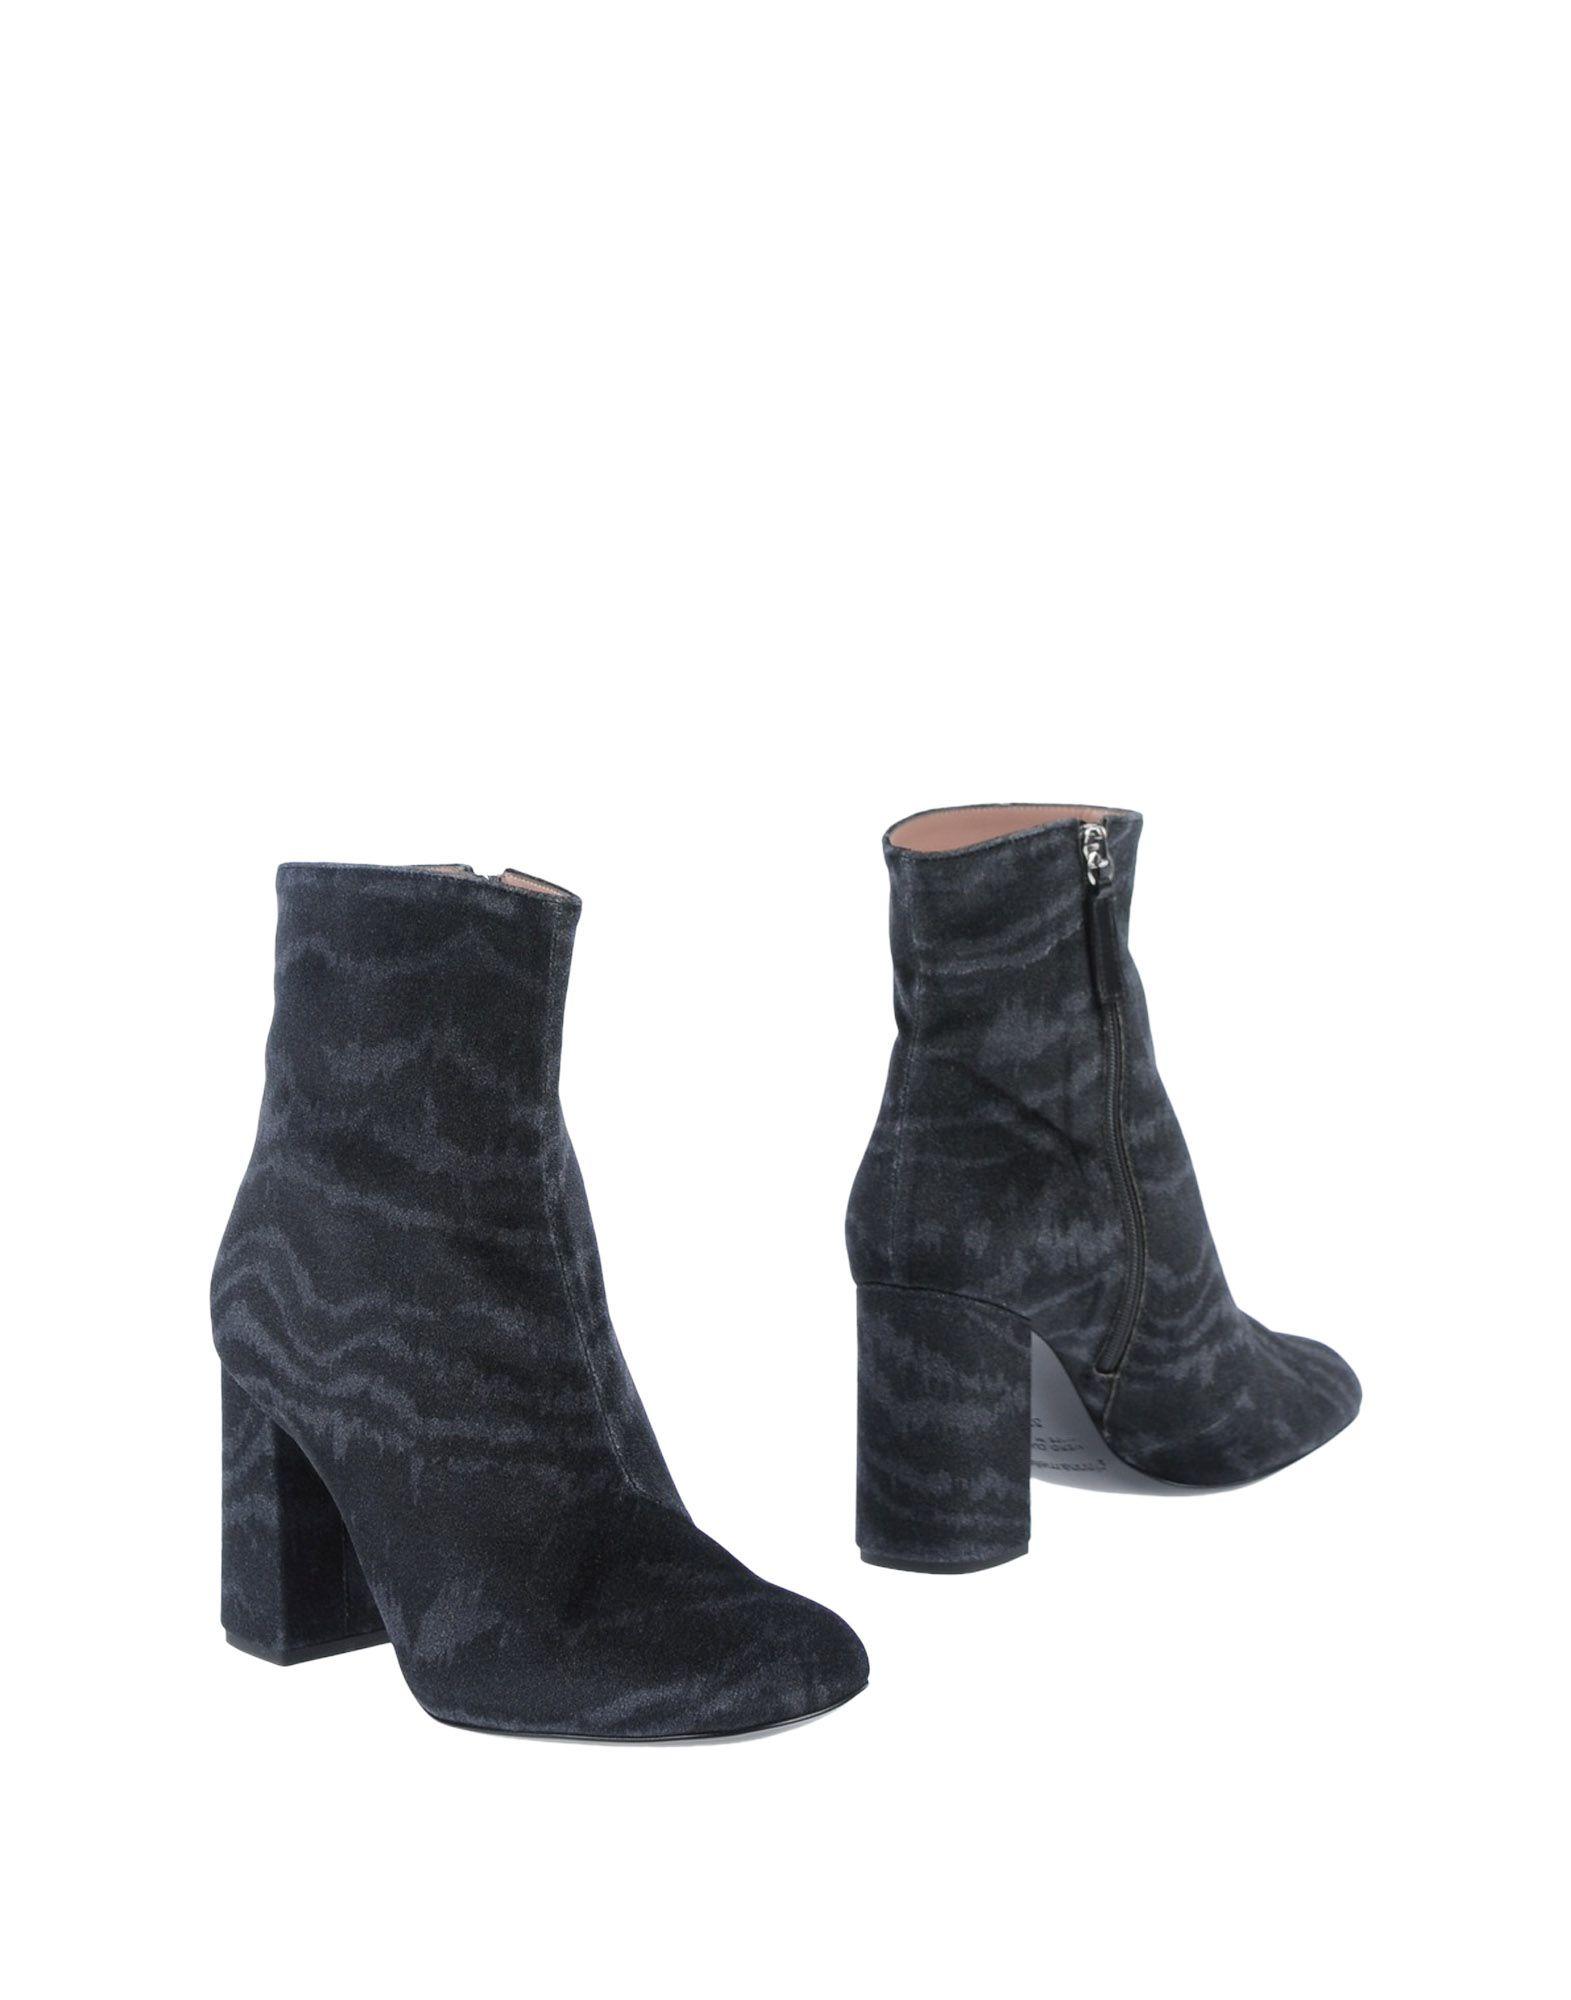 Gianna 11507247DQGut Meliani Stiefelette Damen  11507247DQGut Gianna aussehende strapazierfähige Schuhe 40375d